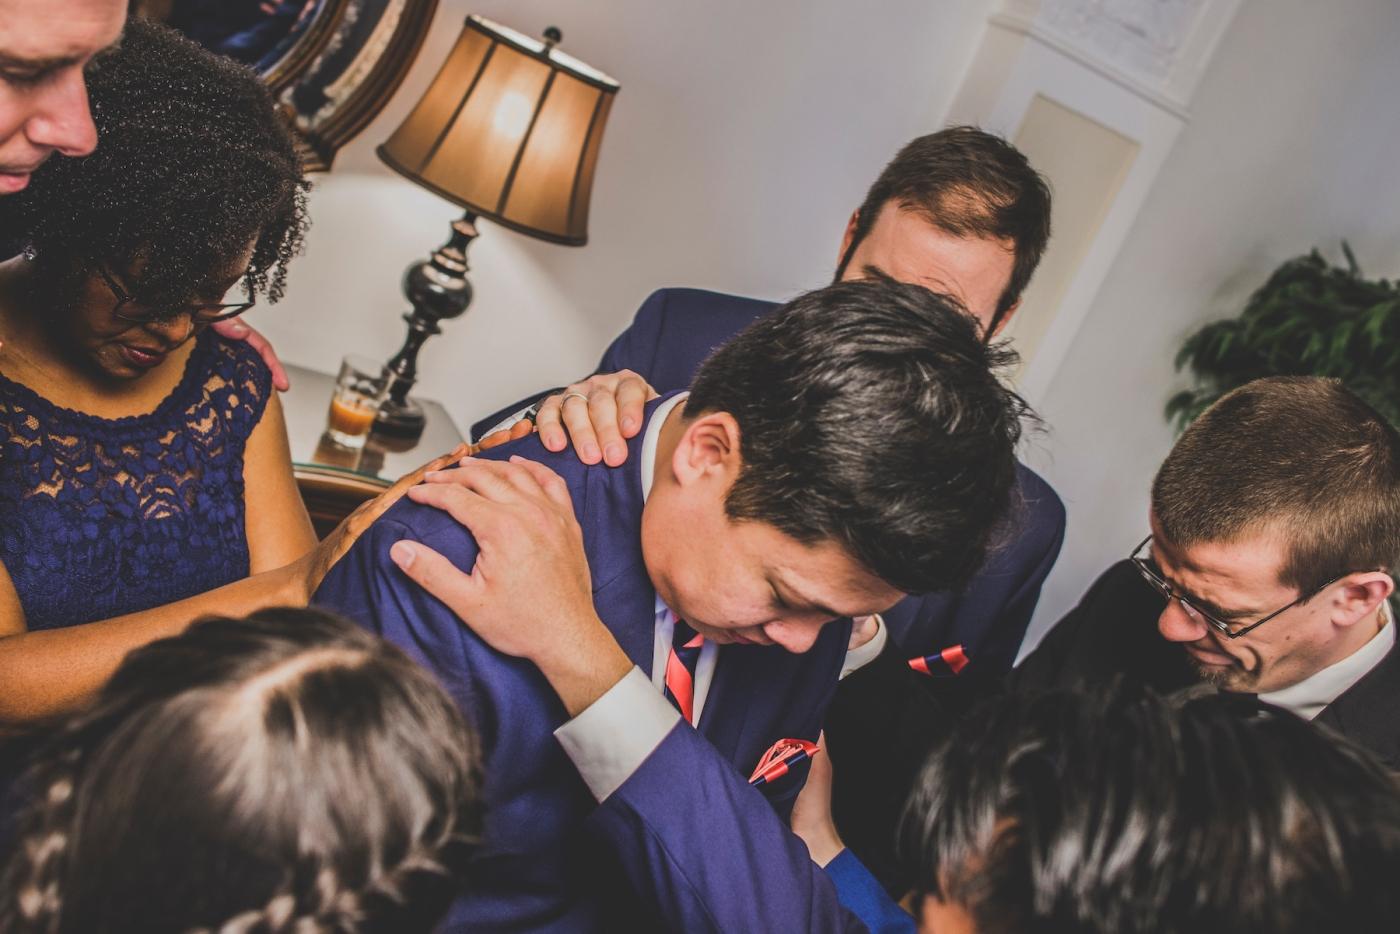 DSC_2389Everett_Wedding_Ballroom_Jane_Speleers_photography_Rachel_and_Edmund_Praying_2017